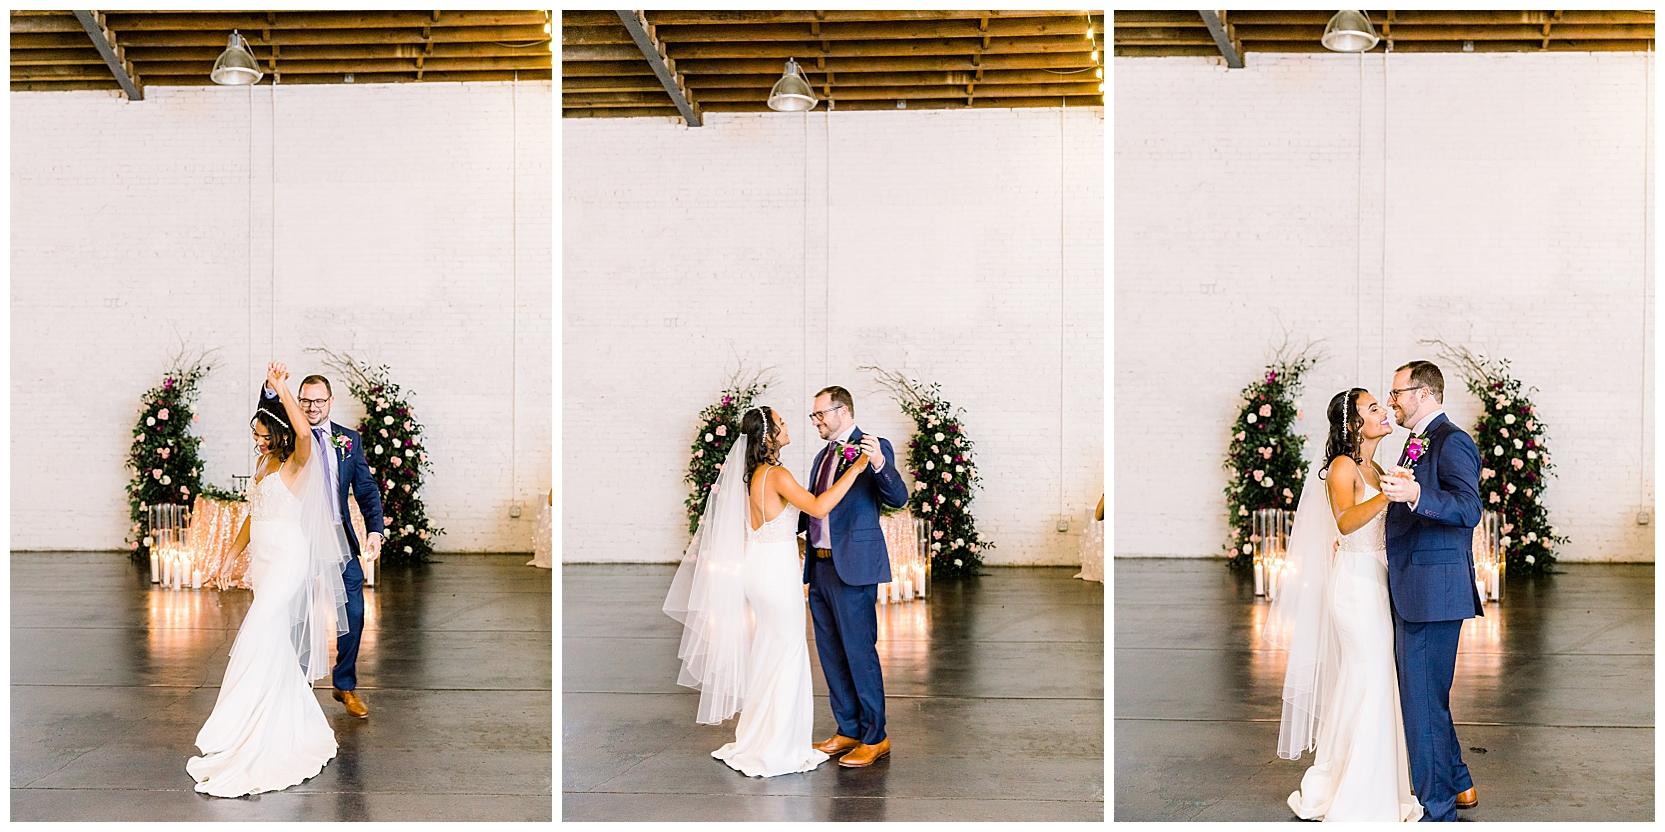 jessicafredericks_lakeland_tampa_wedding_purple_crazy hour_0071.jpg